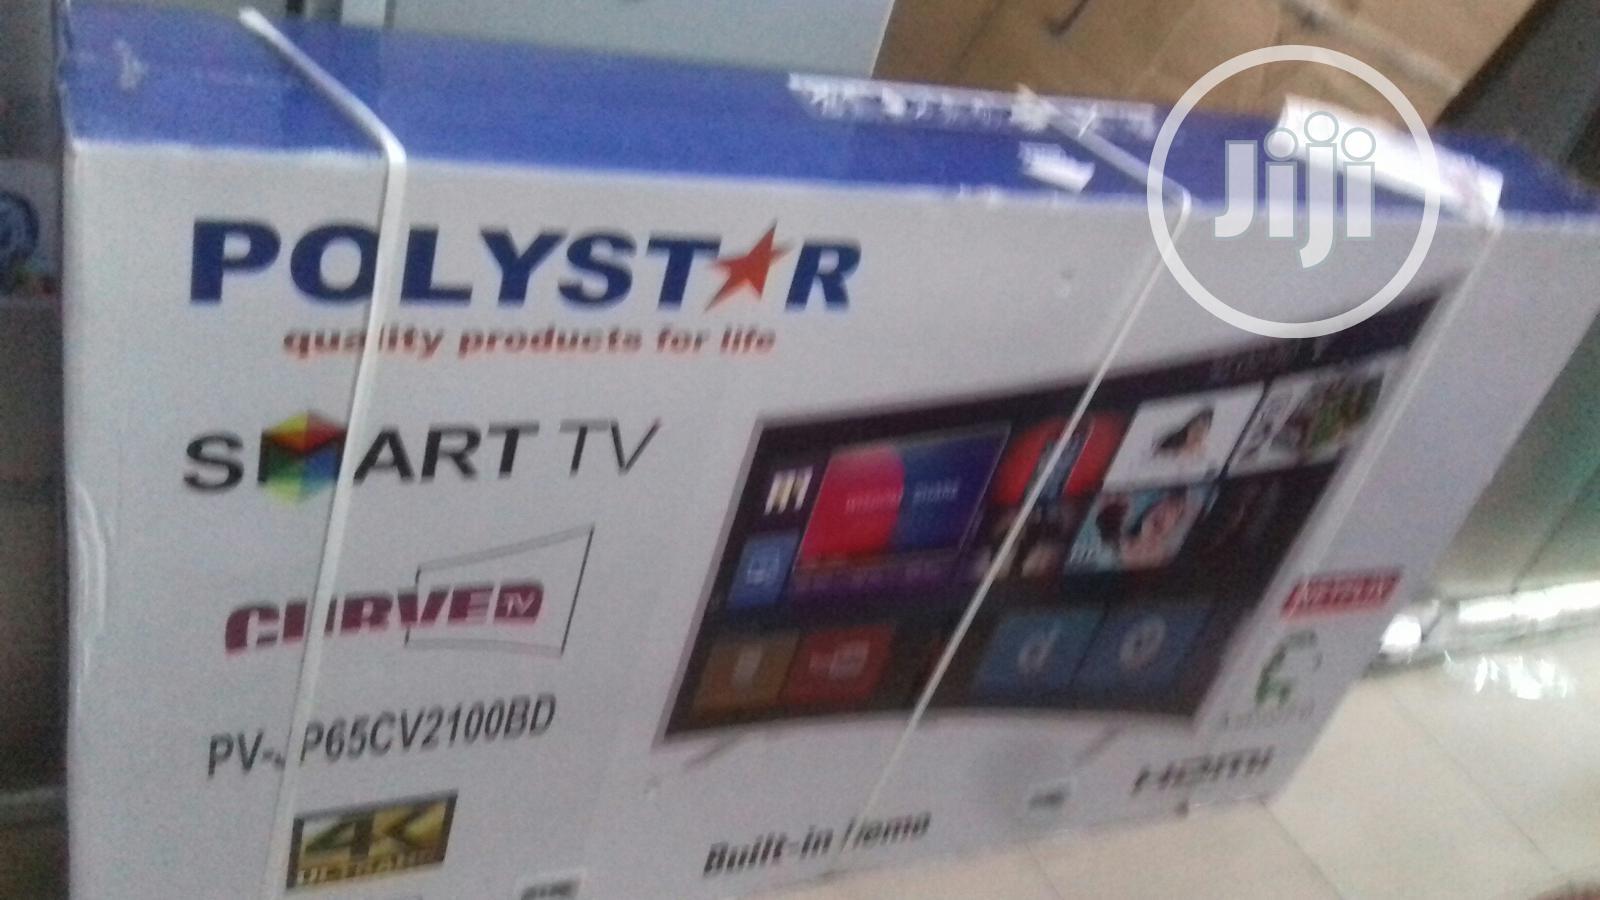 Polystar 65inch Curve Smart Tv